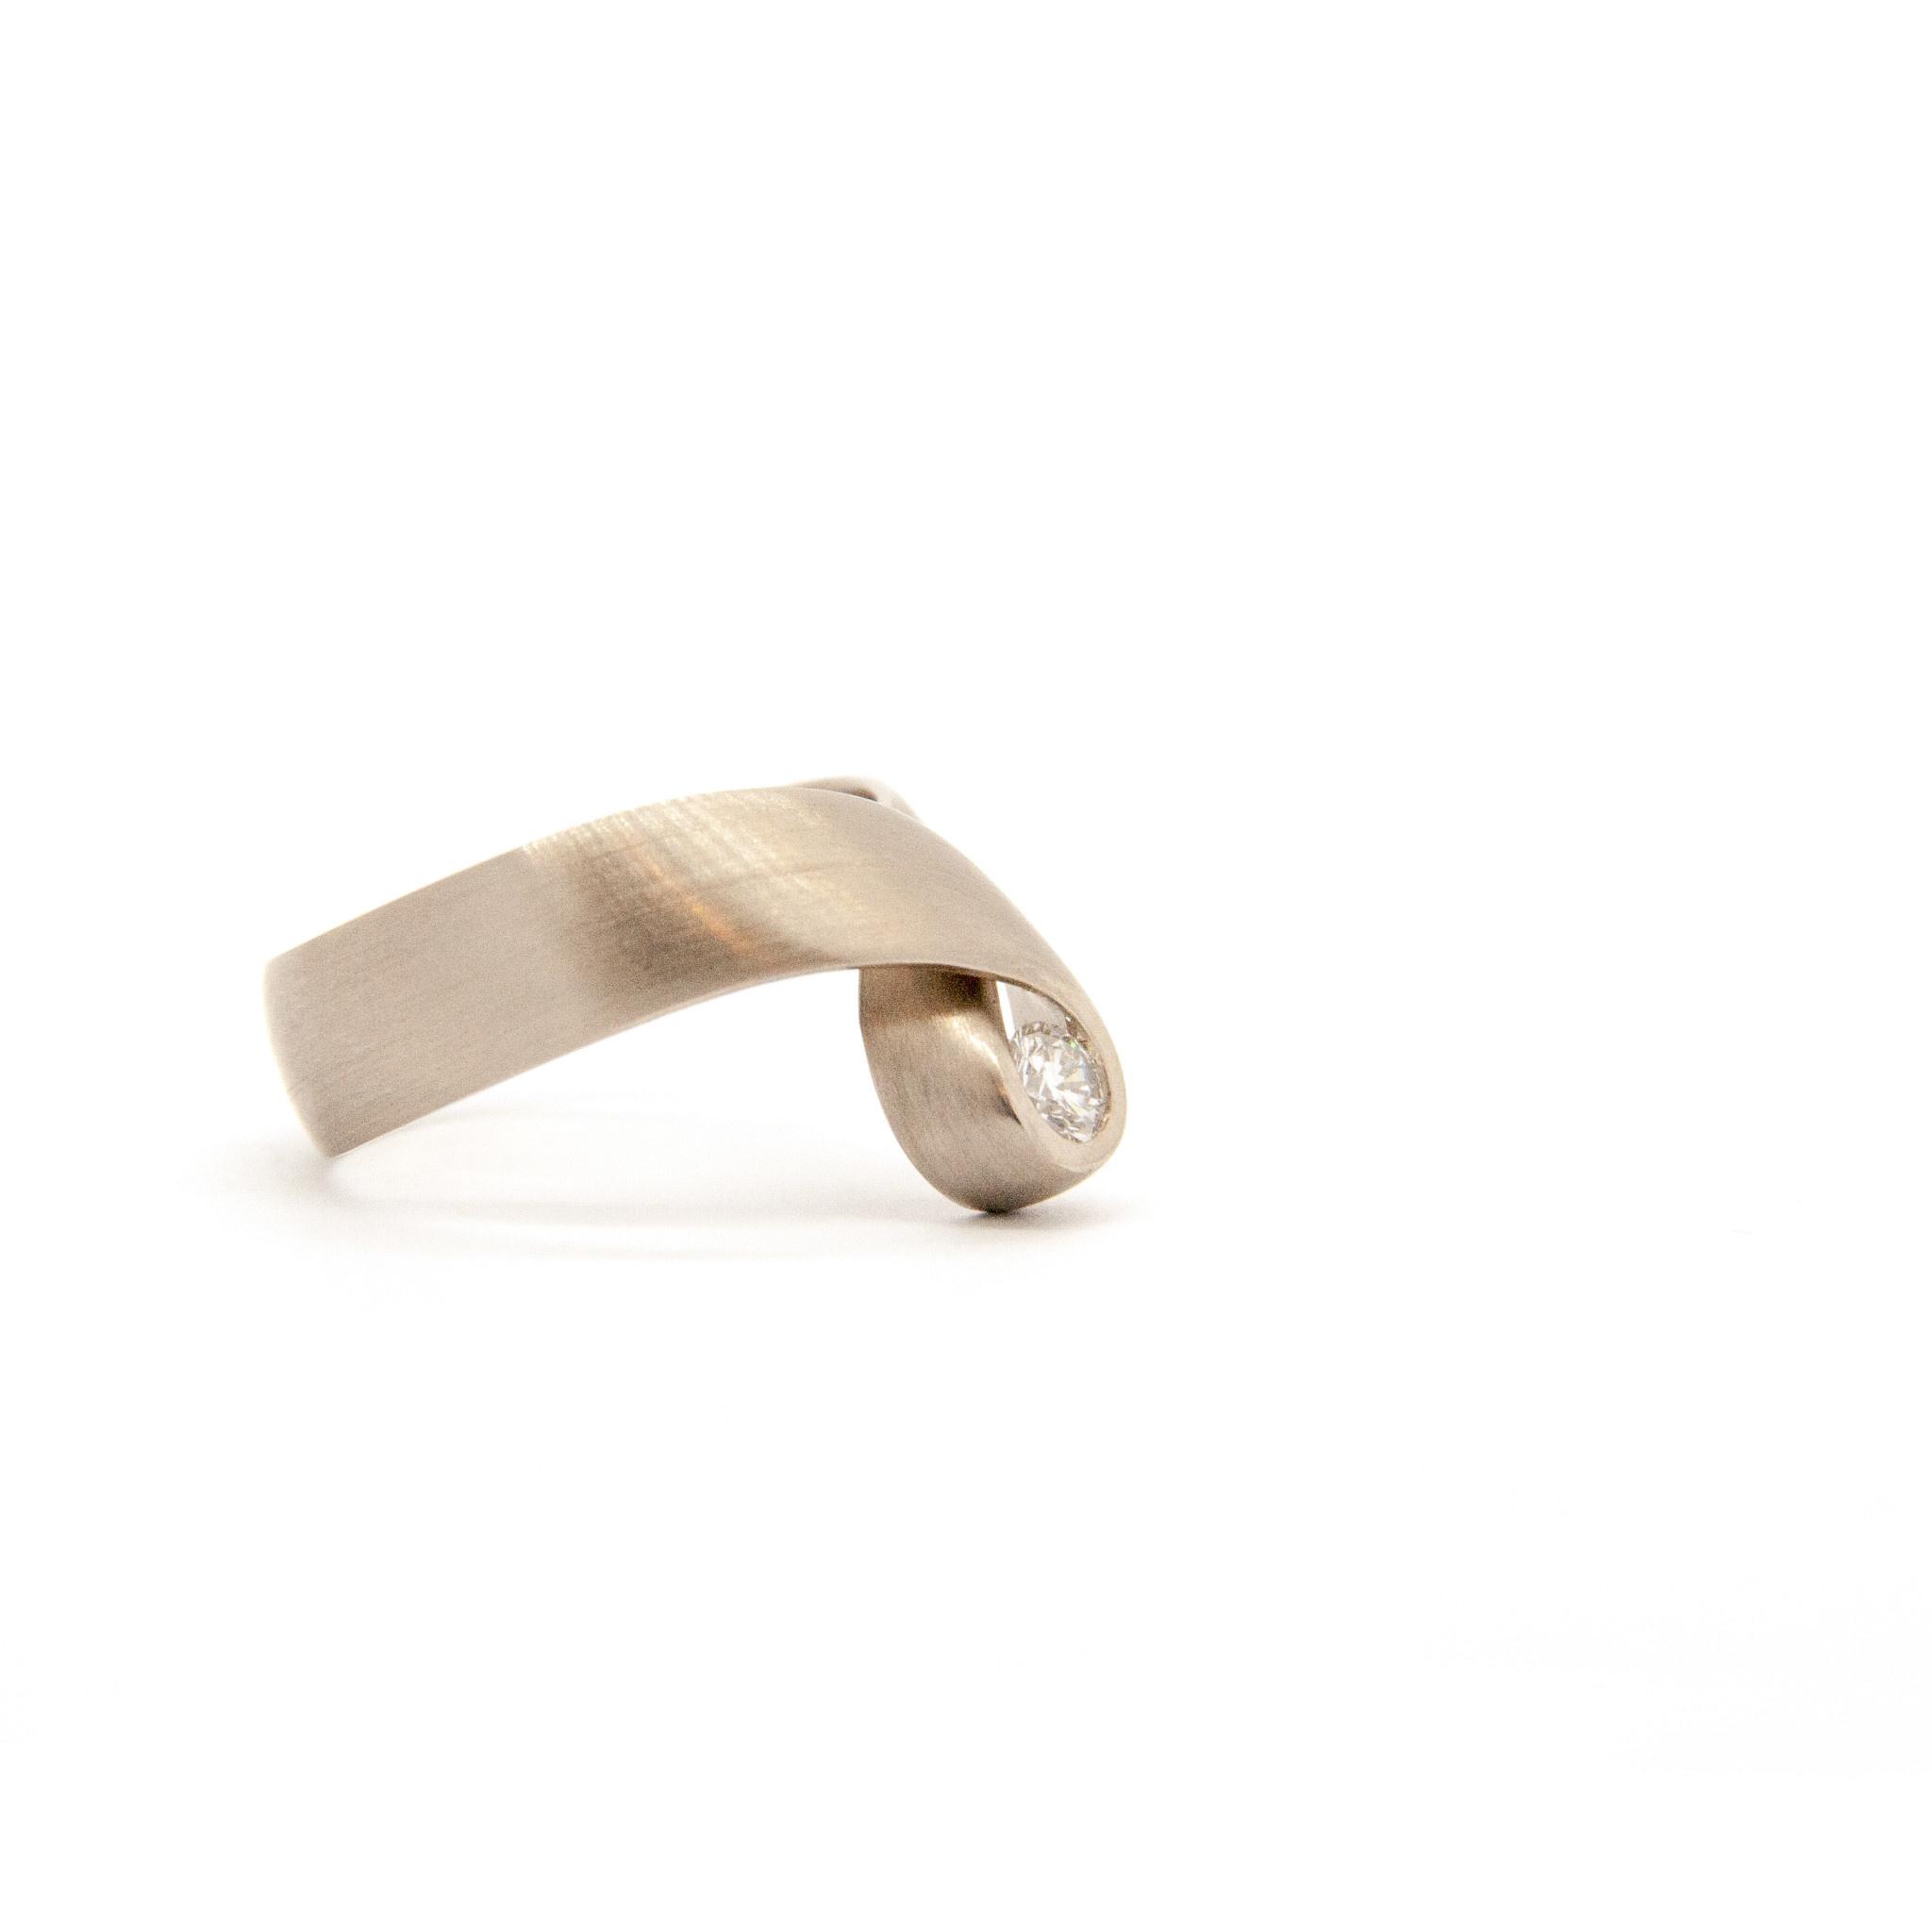 14k white gold ring size 56-7